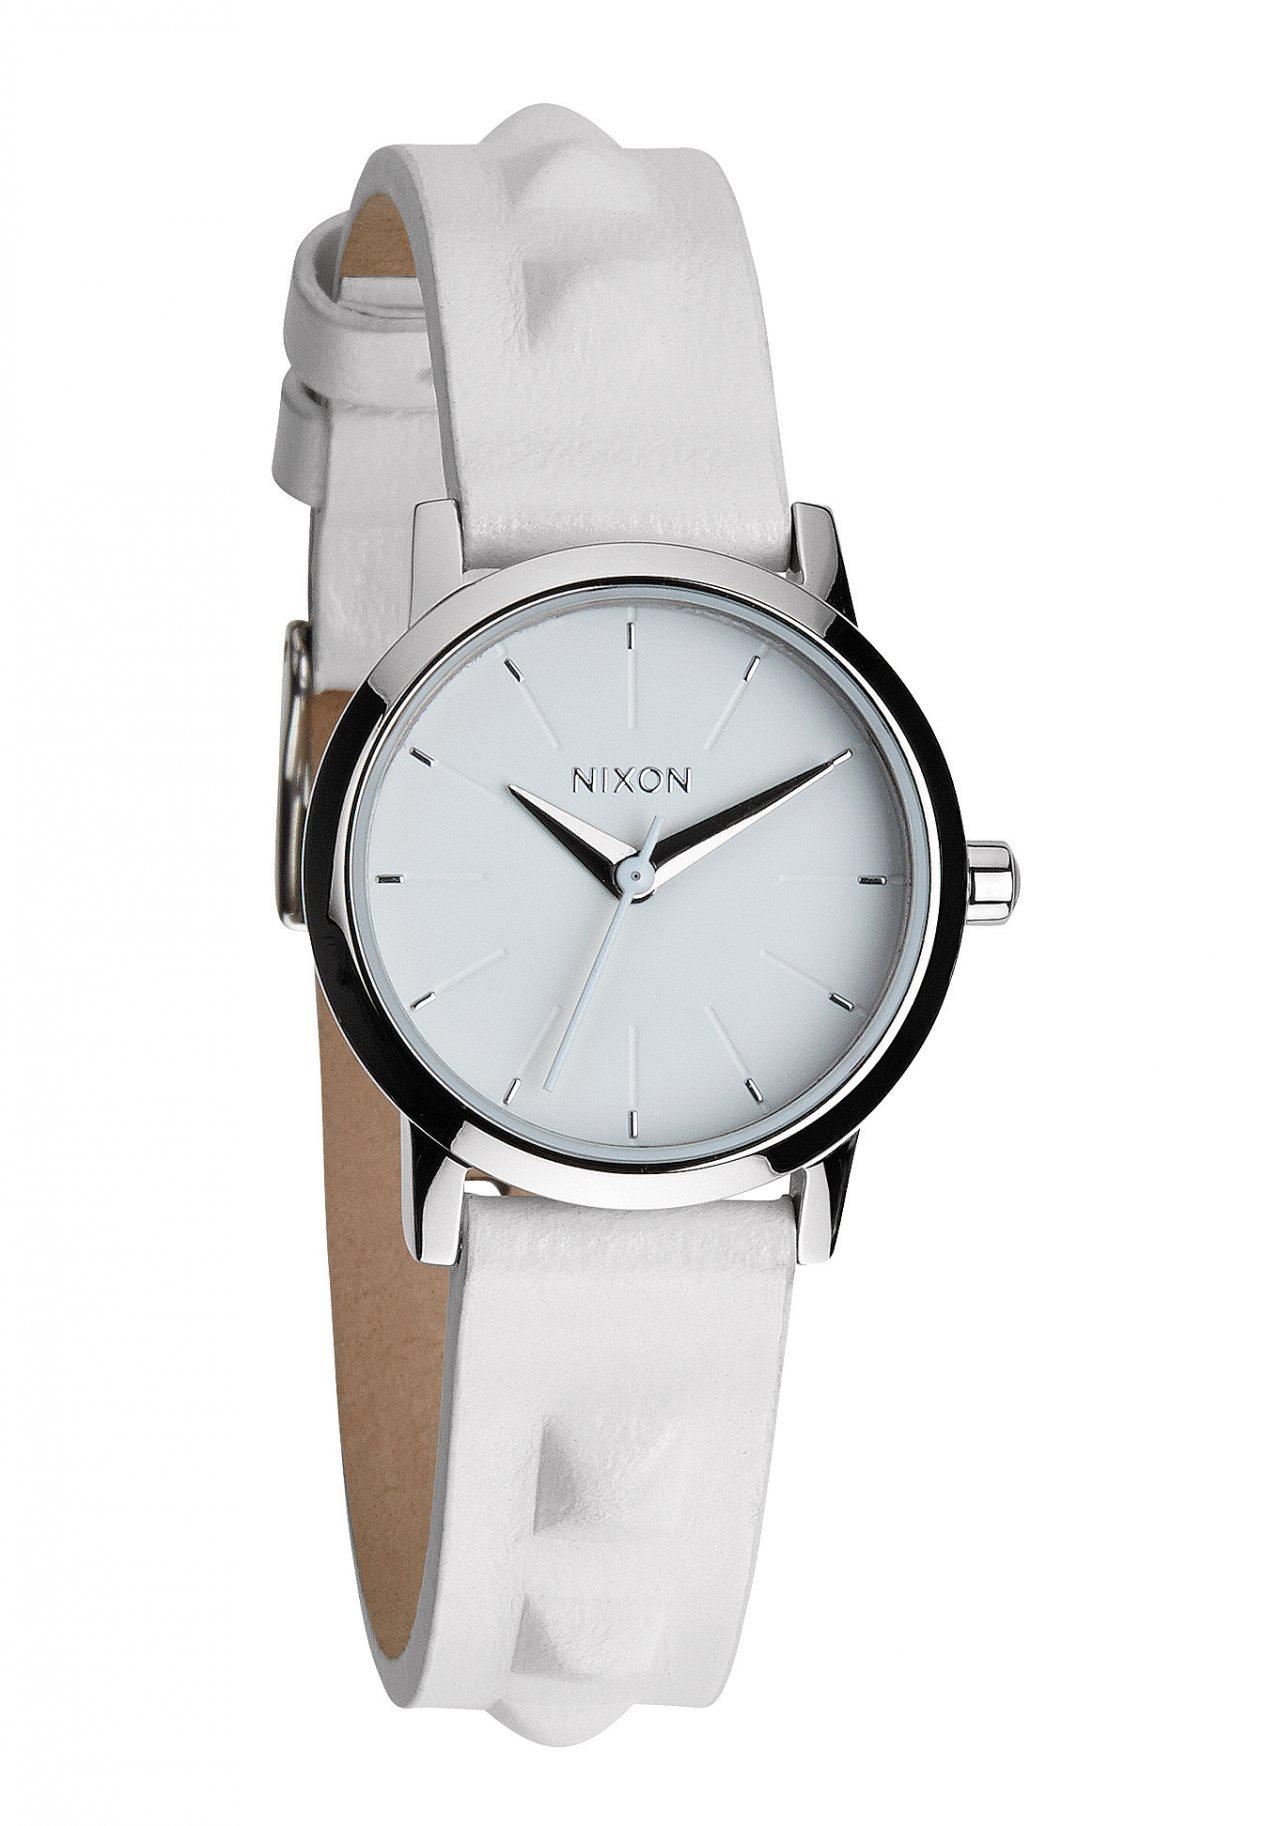 nixon the kenzi leather all white studded a3981811 nur 69 00. Black Bedroom Furniture Sets. Home Design Ideas